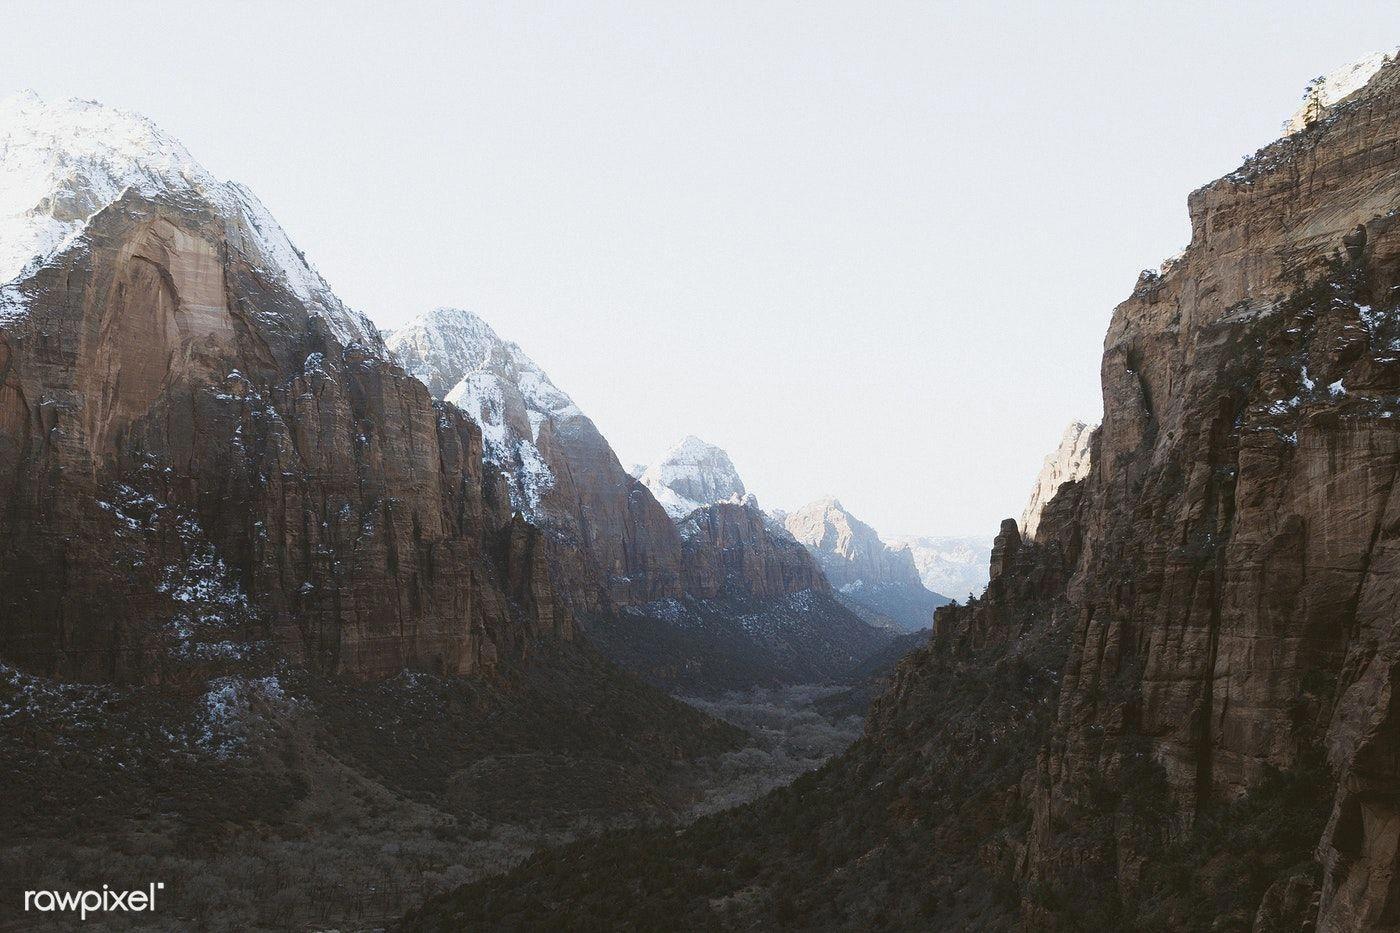 View of Zion National Park in Utah, USA | free image by rawpixel.com / HB Mertz #utahusa